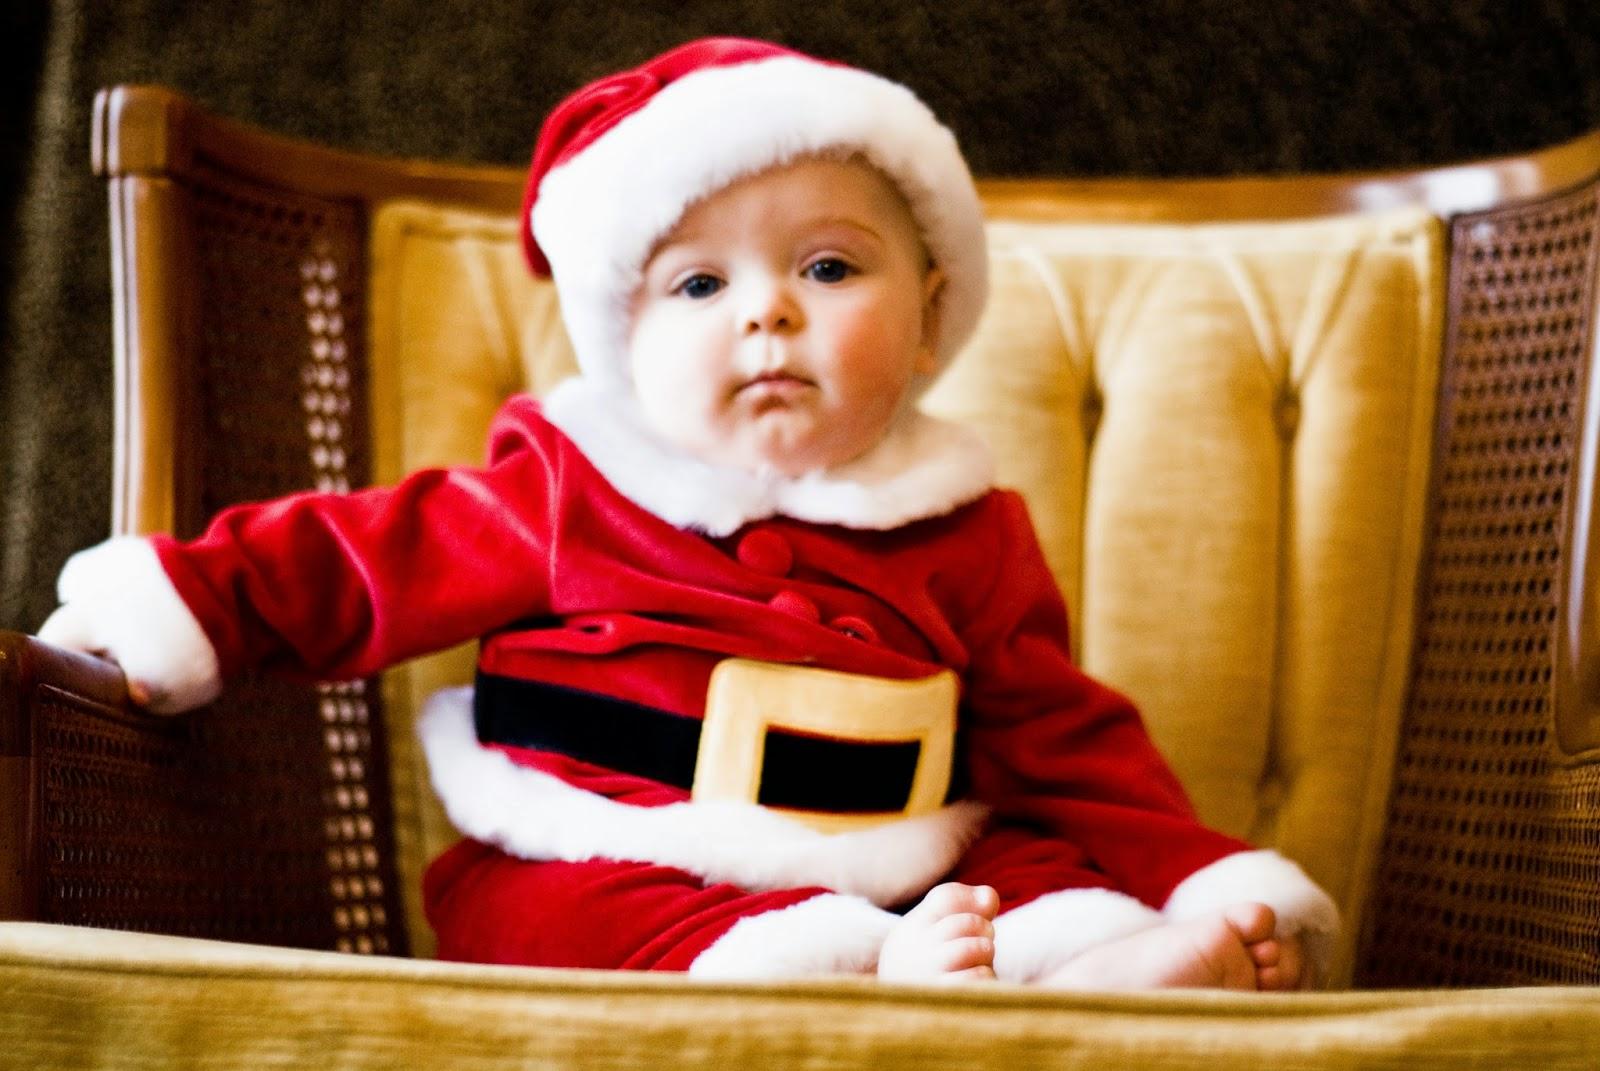 Gambar lucu bayi memakai kostum hari natal